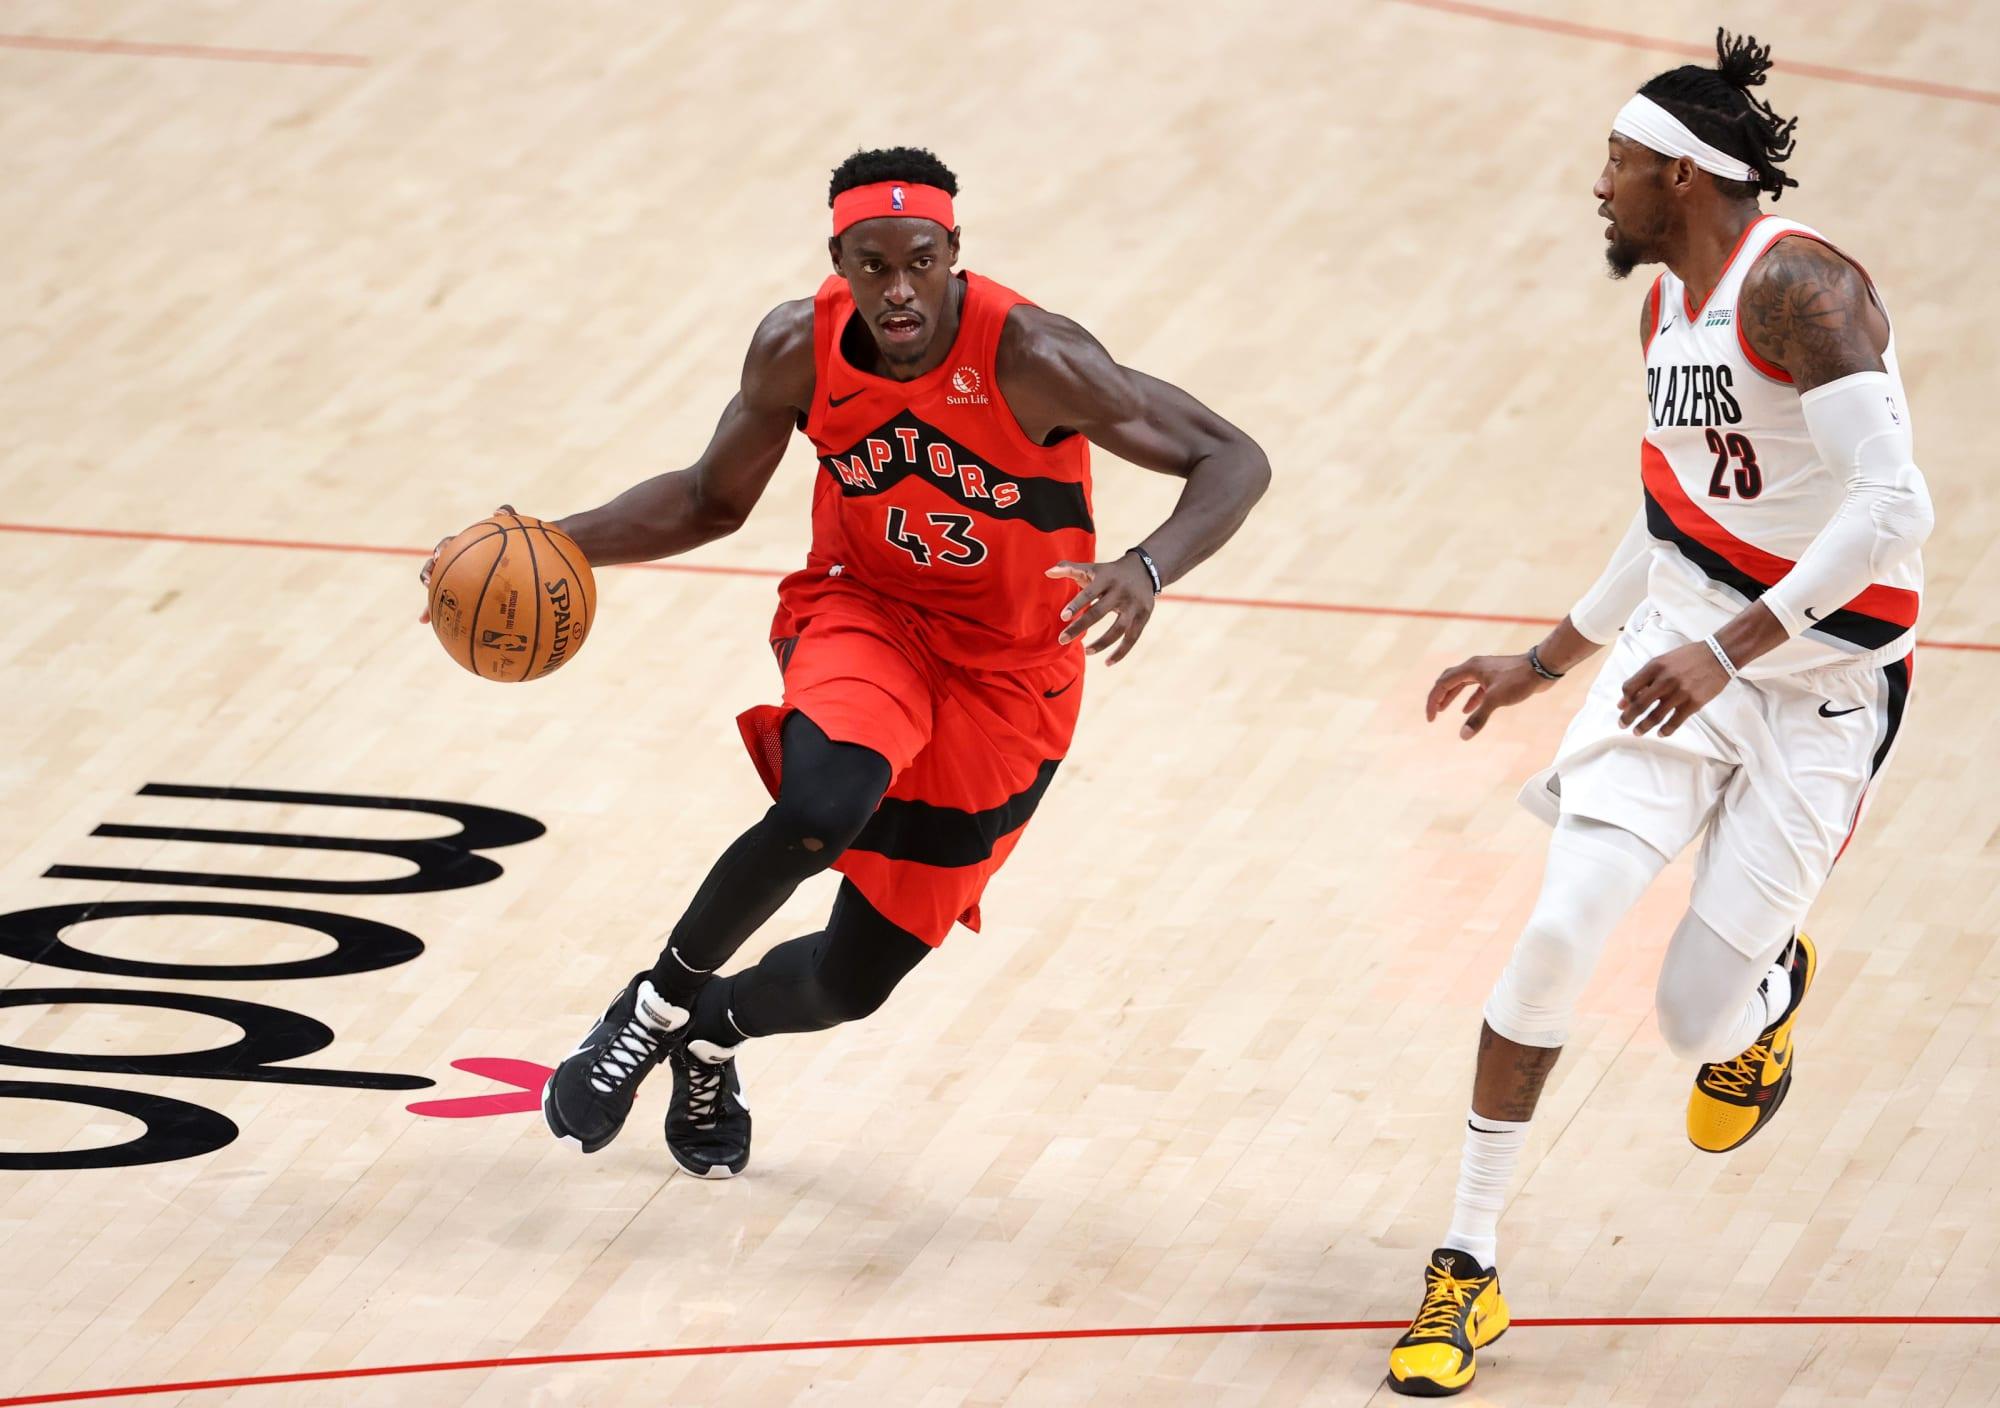 Toronto Raptors: The Pascal Siakam Slander Needs to Stop